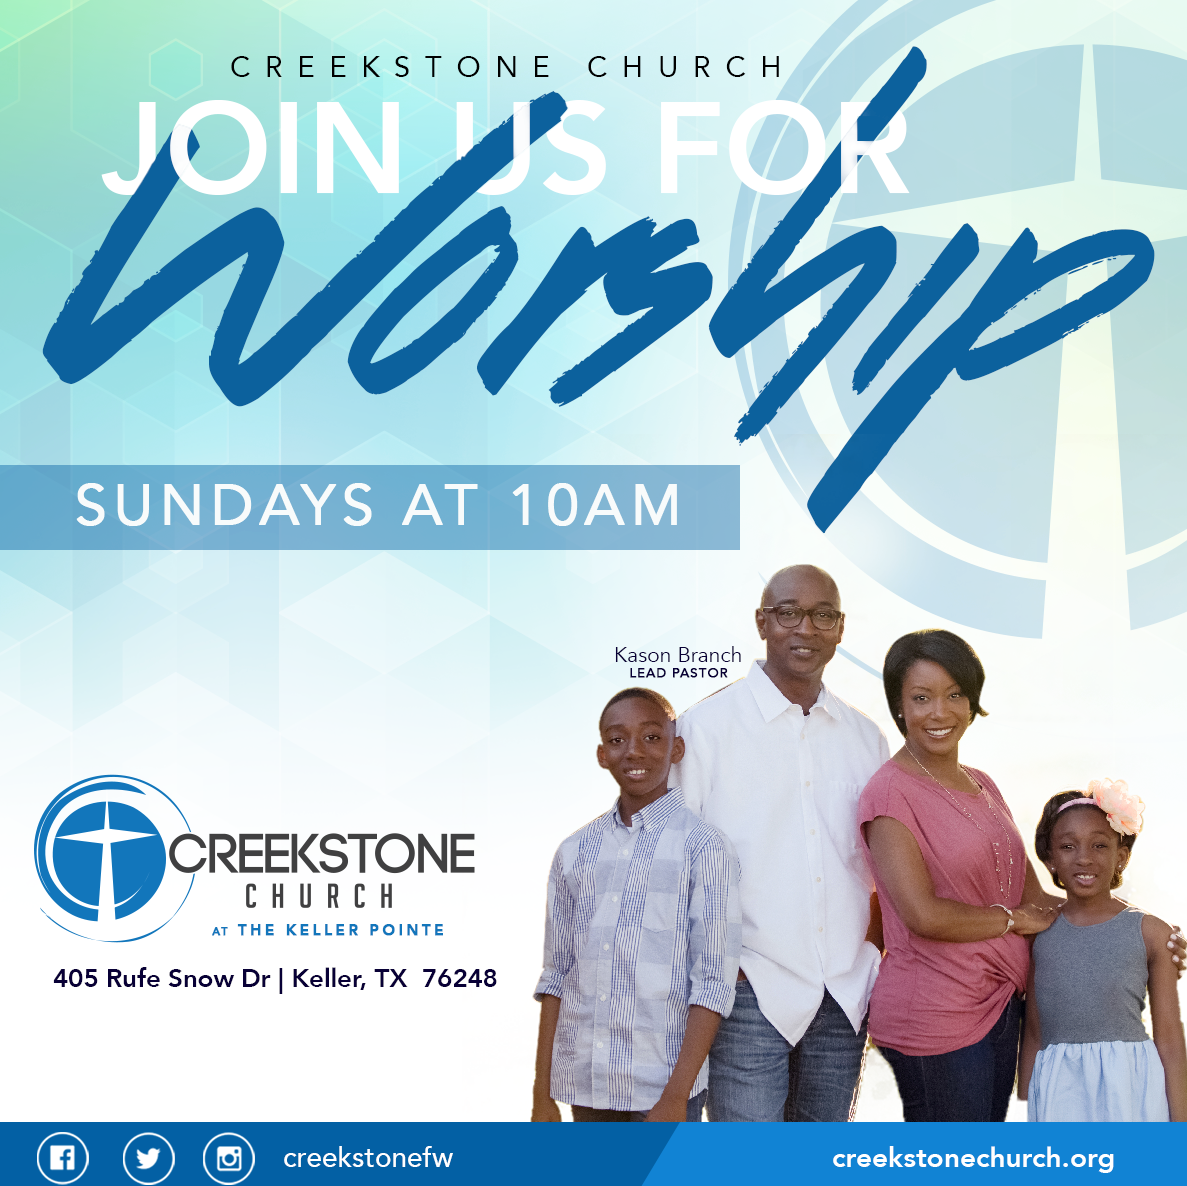 Join-Us-Creekstone-Church